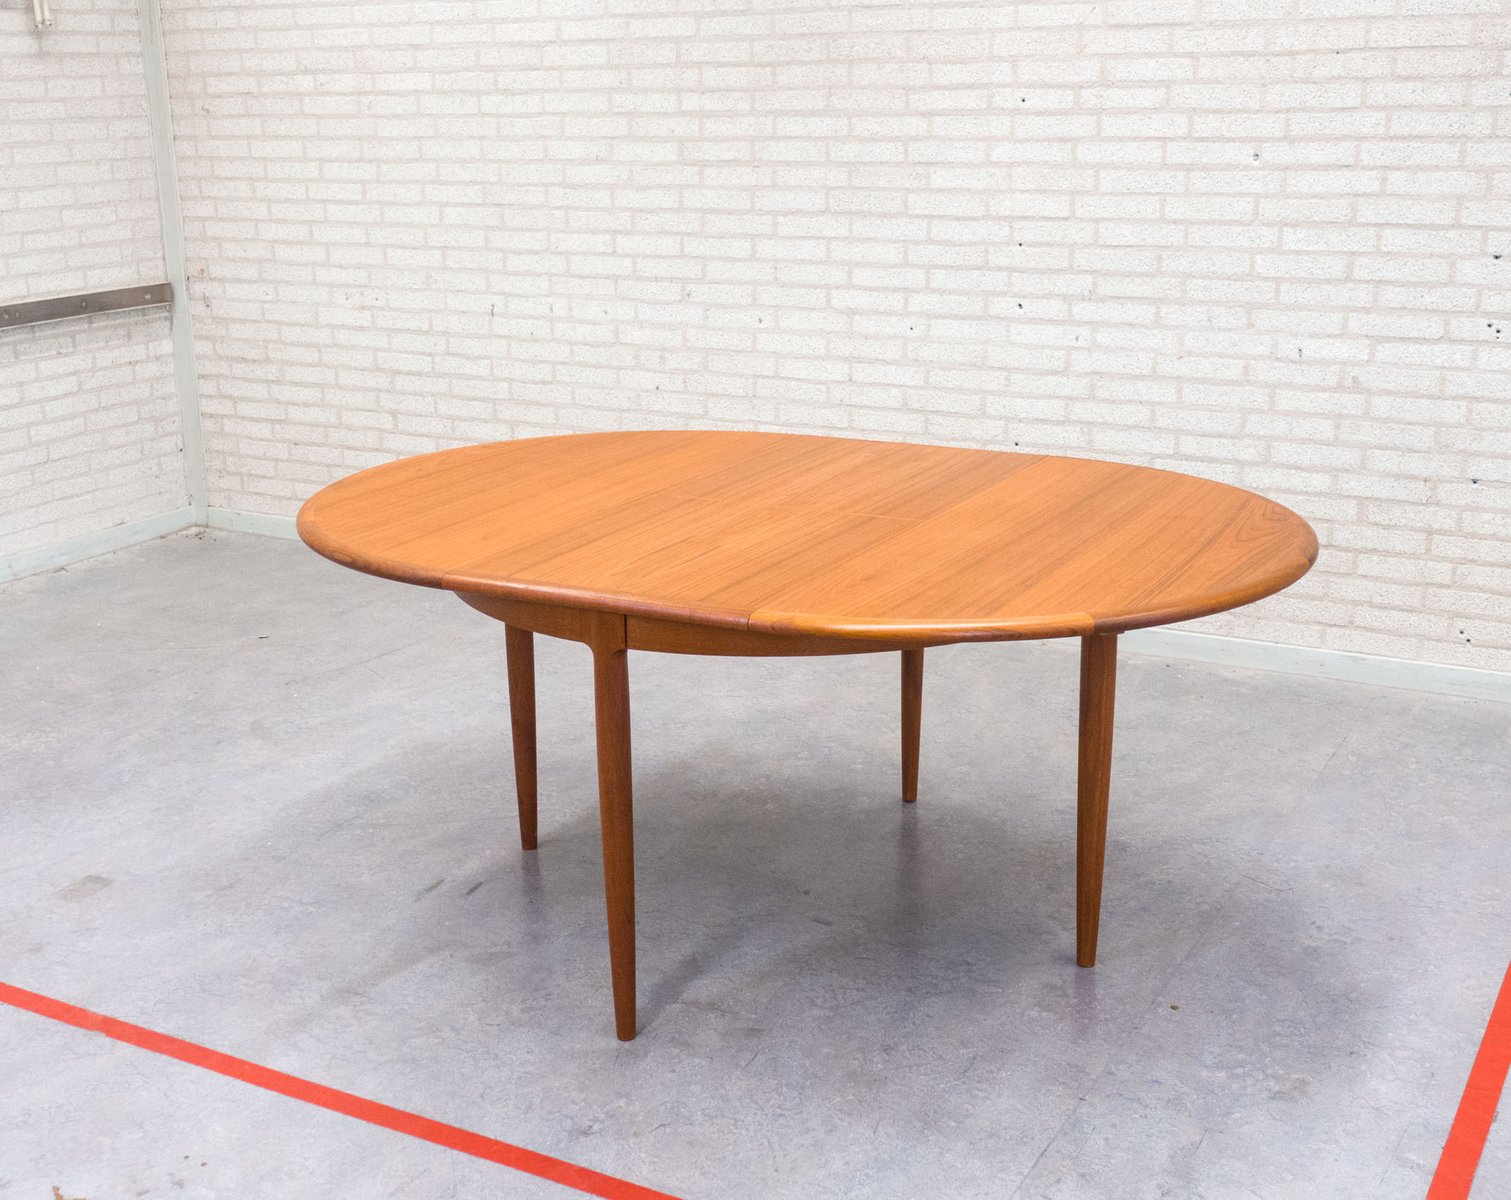 Vintage Extendable Teak Dining Table by Niels Otto M248ller  : vintage extendable teak dining table by niels otto moller for j l mollers 2 from www.pamono.com size 1511 x 1200 jpeg 181kB